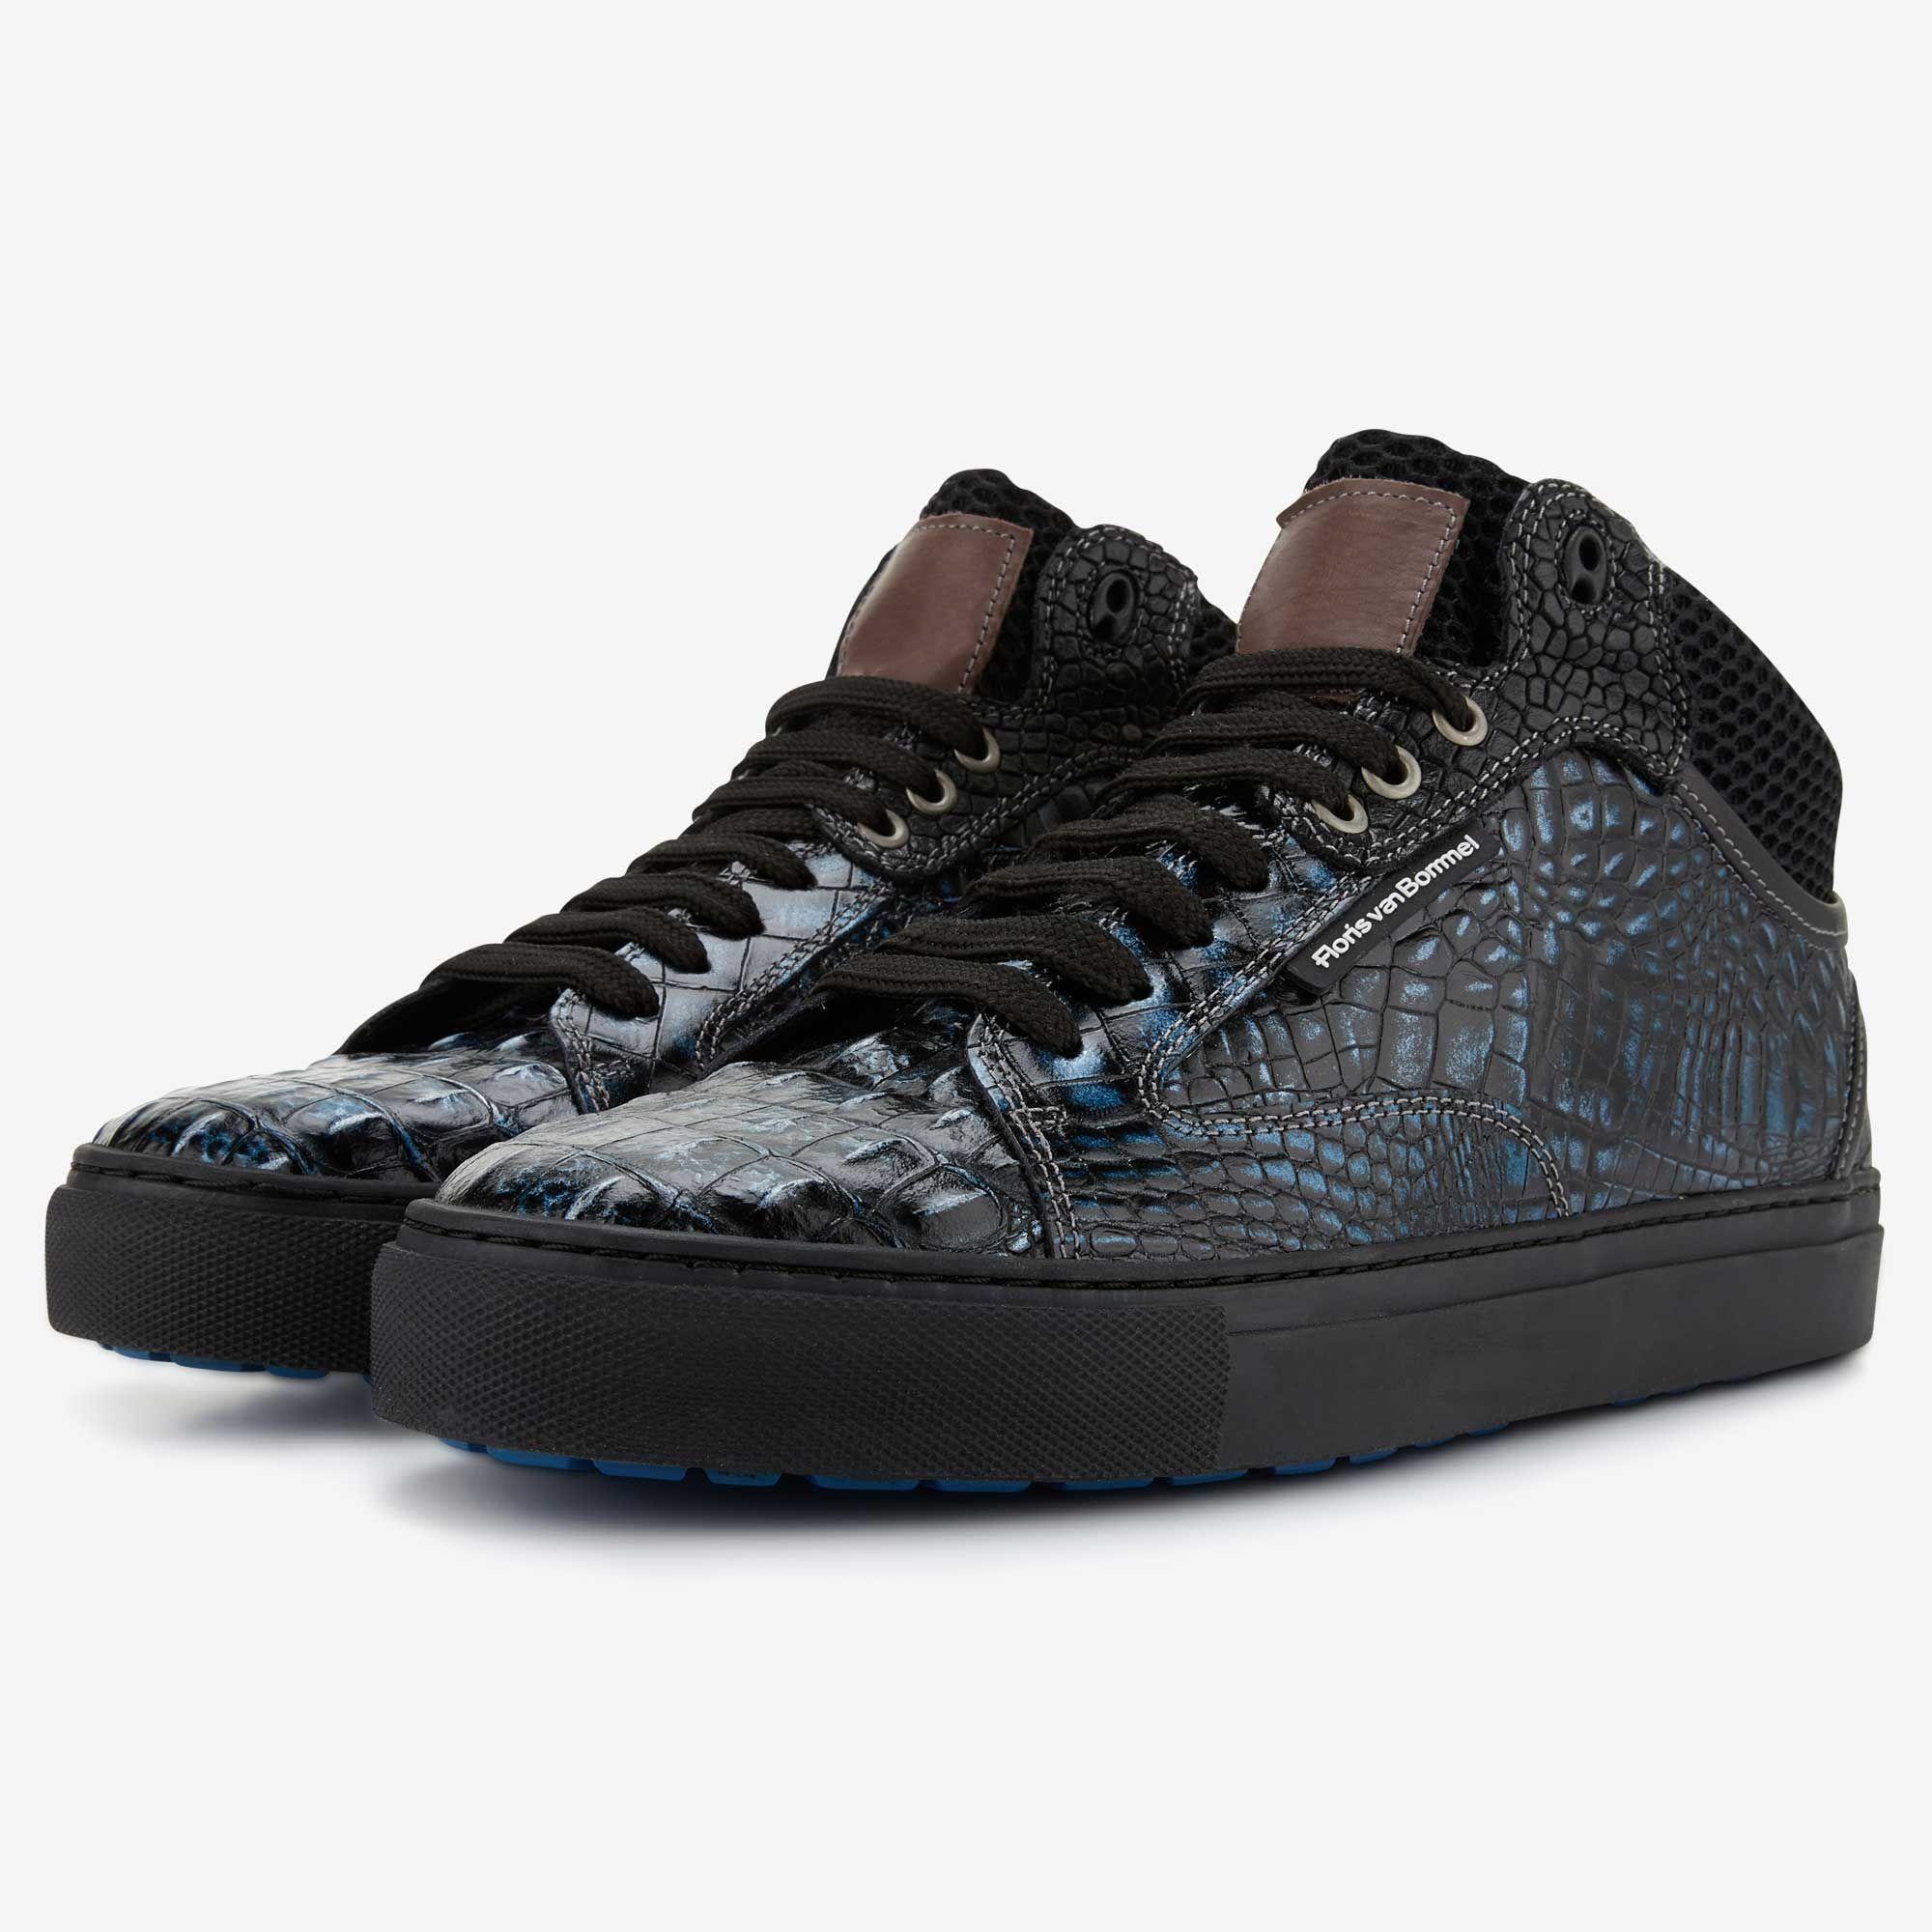 Blue metallic men s sneaker with crocodile print 10864 02 Floris van Bommel bcab3a4a9